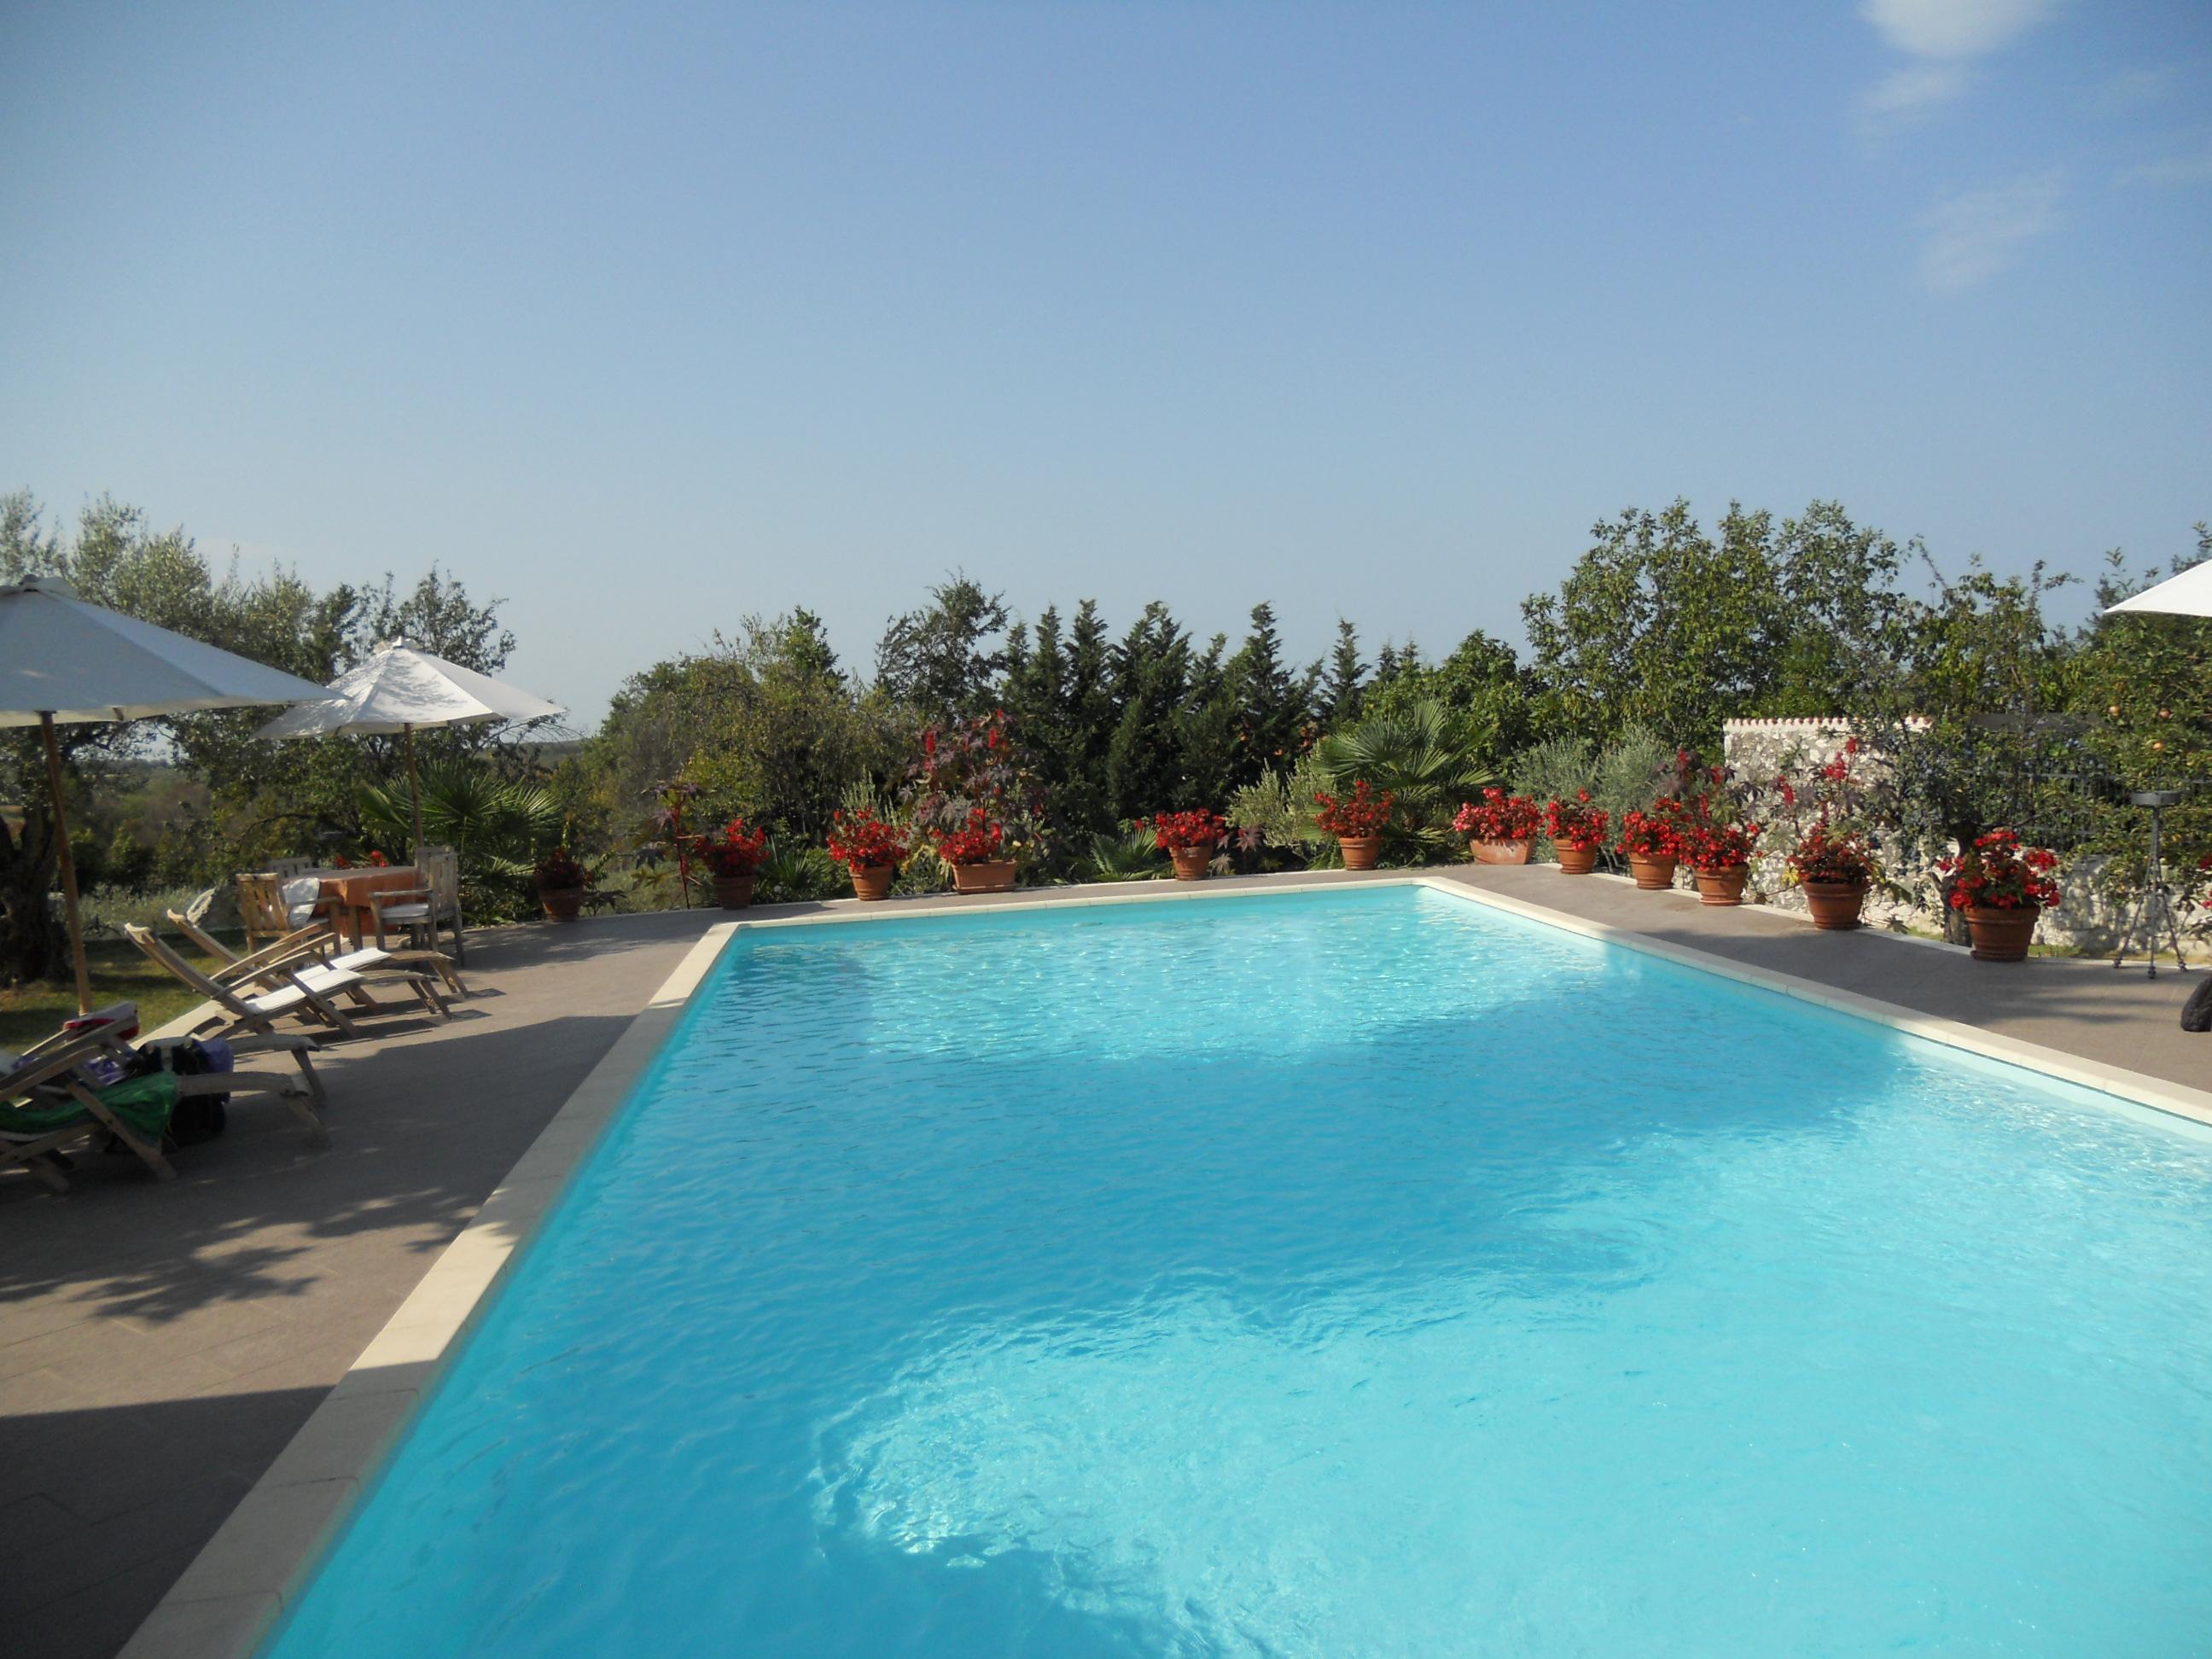 H tel de luxe san rocco en croatie c 39 est sexy tourissima for Boutique hotel intermezzo 4 pag croatie